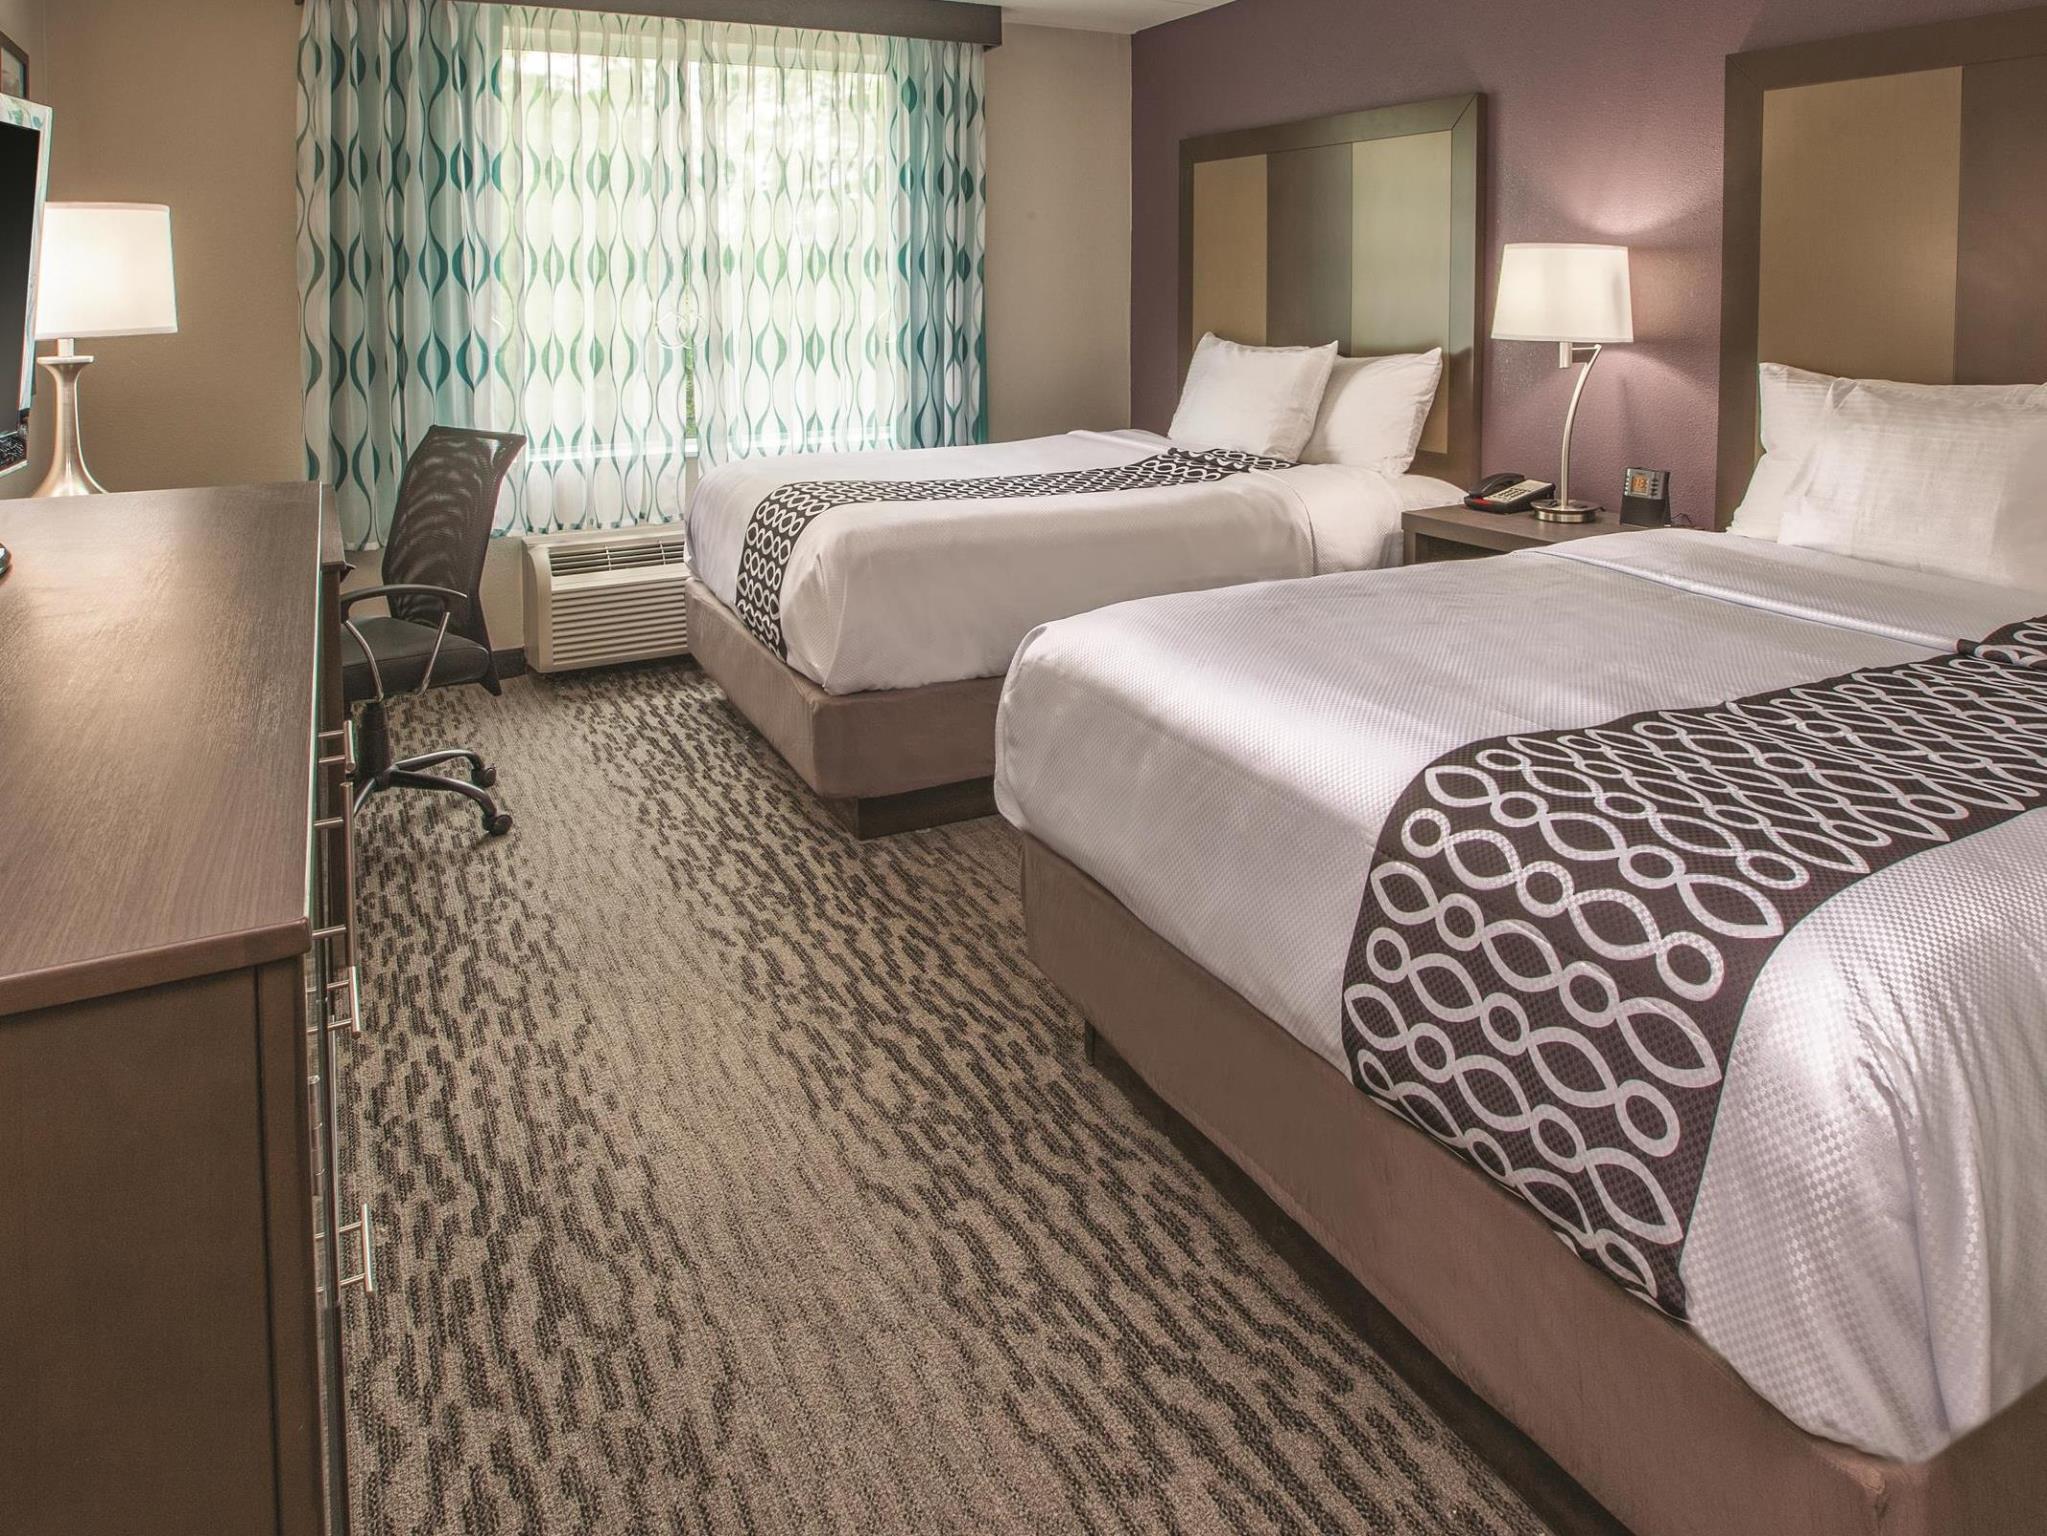 La Quinta Inn & Suites By Wyndham Sturbridge